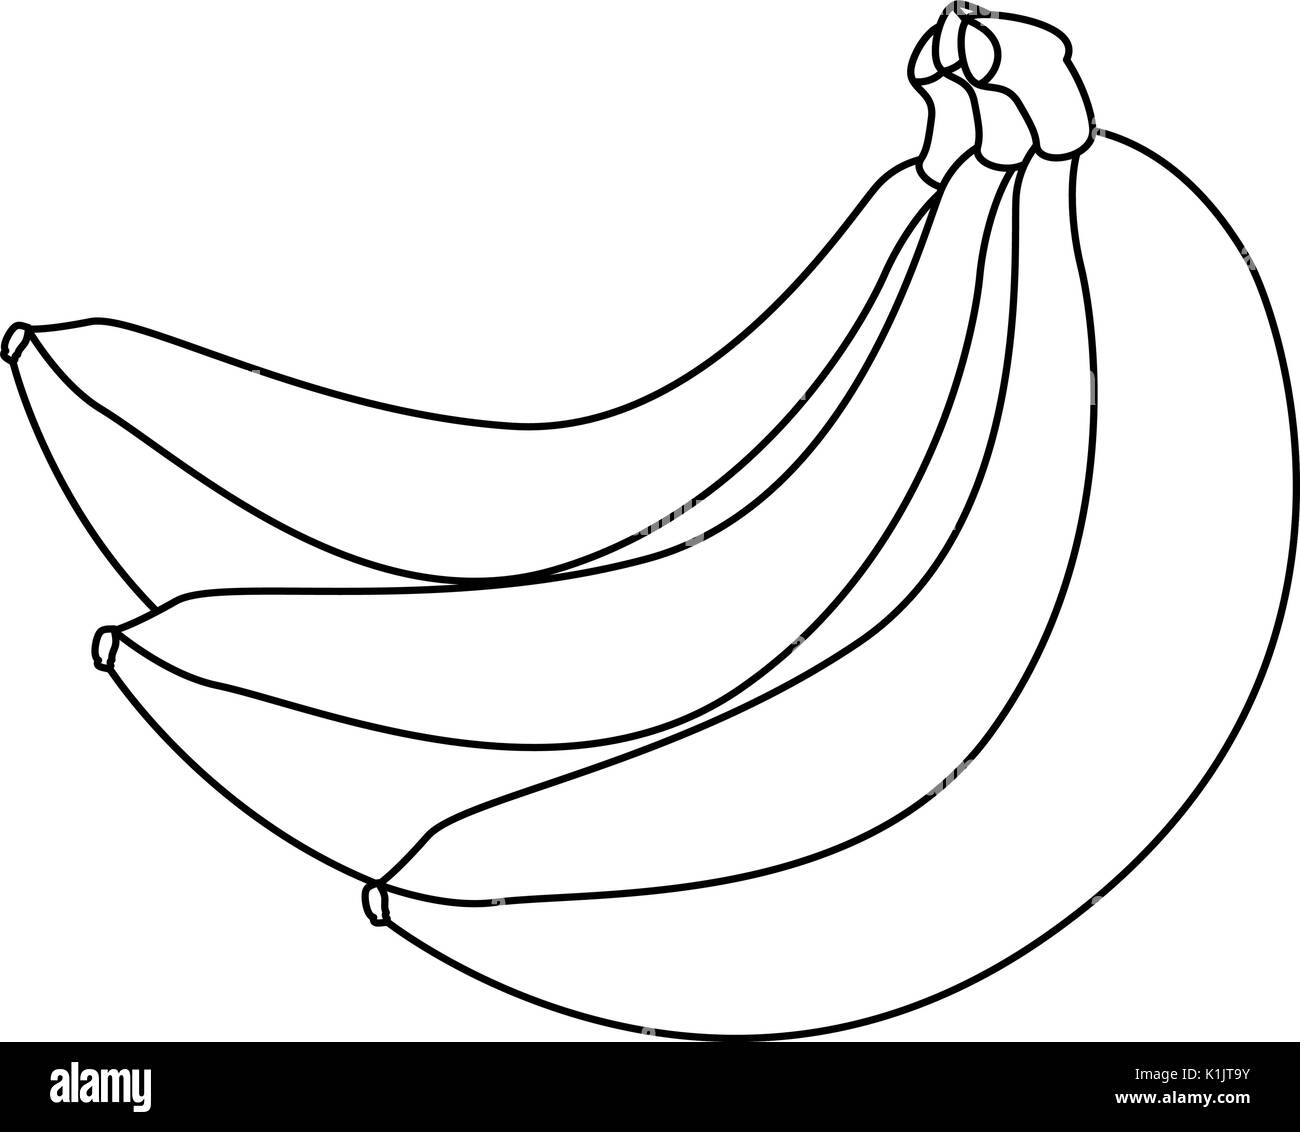 Ripe Bananas Black And White Stock Photos Images Alamy